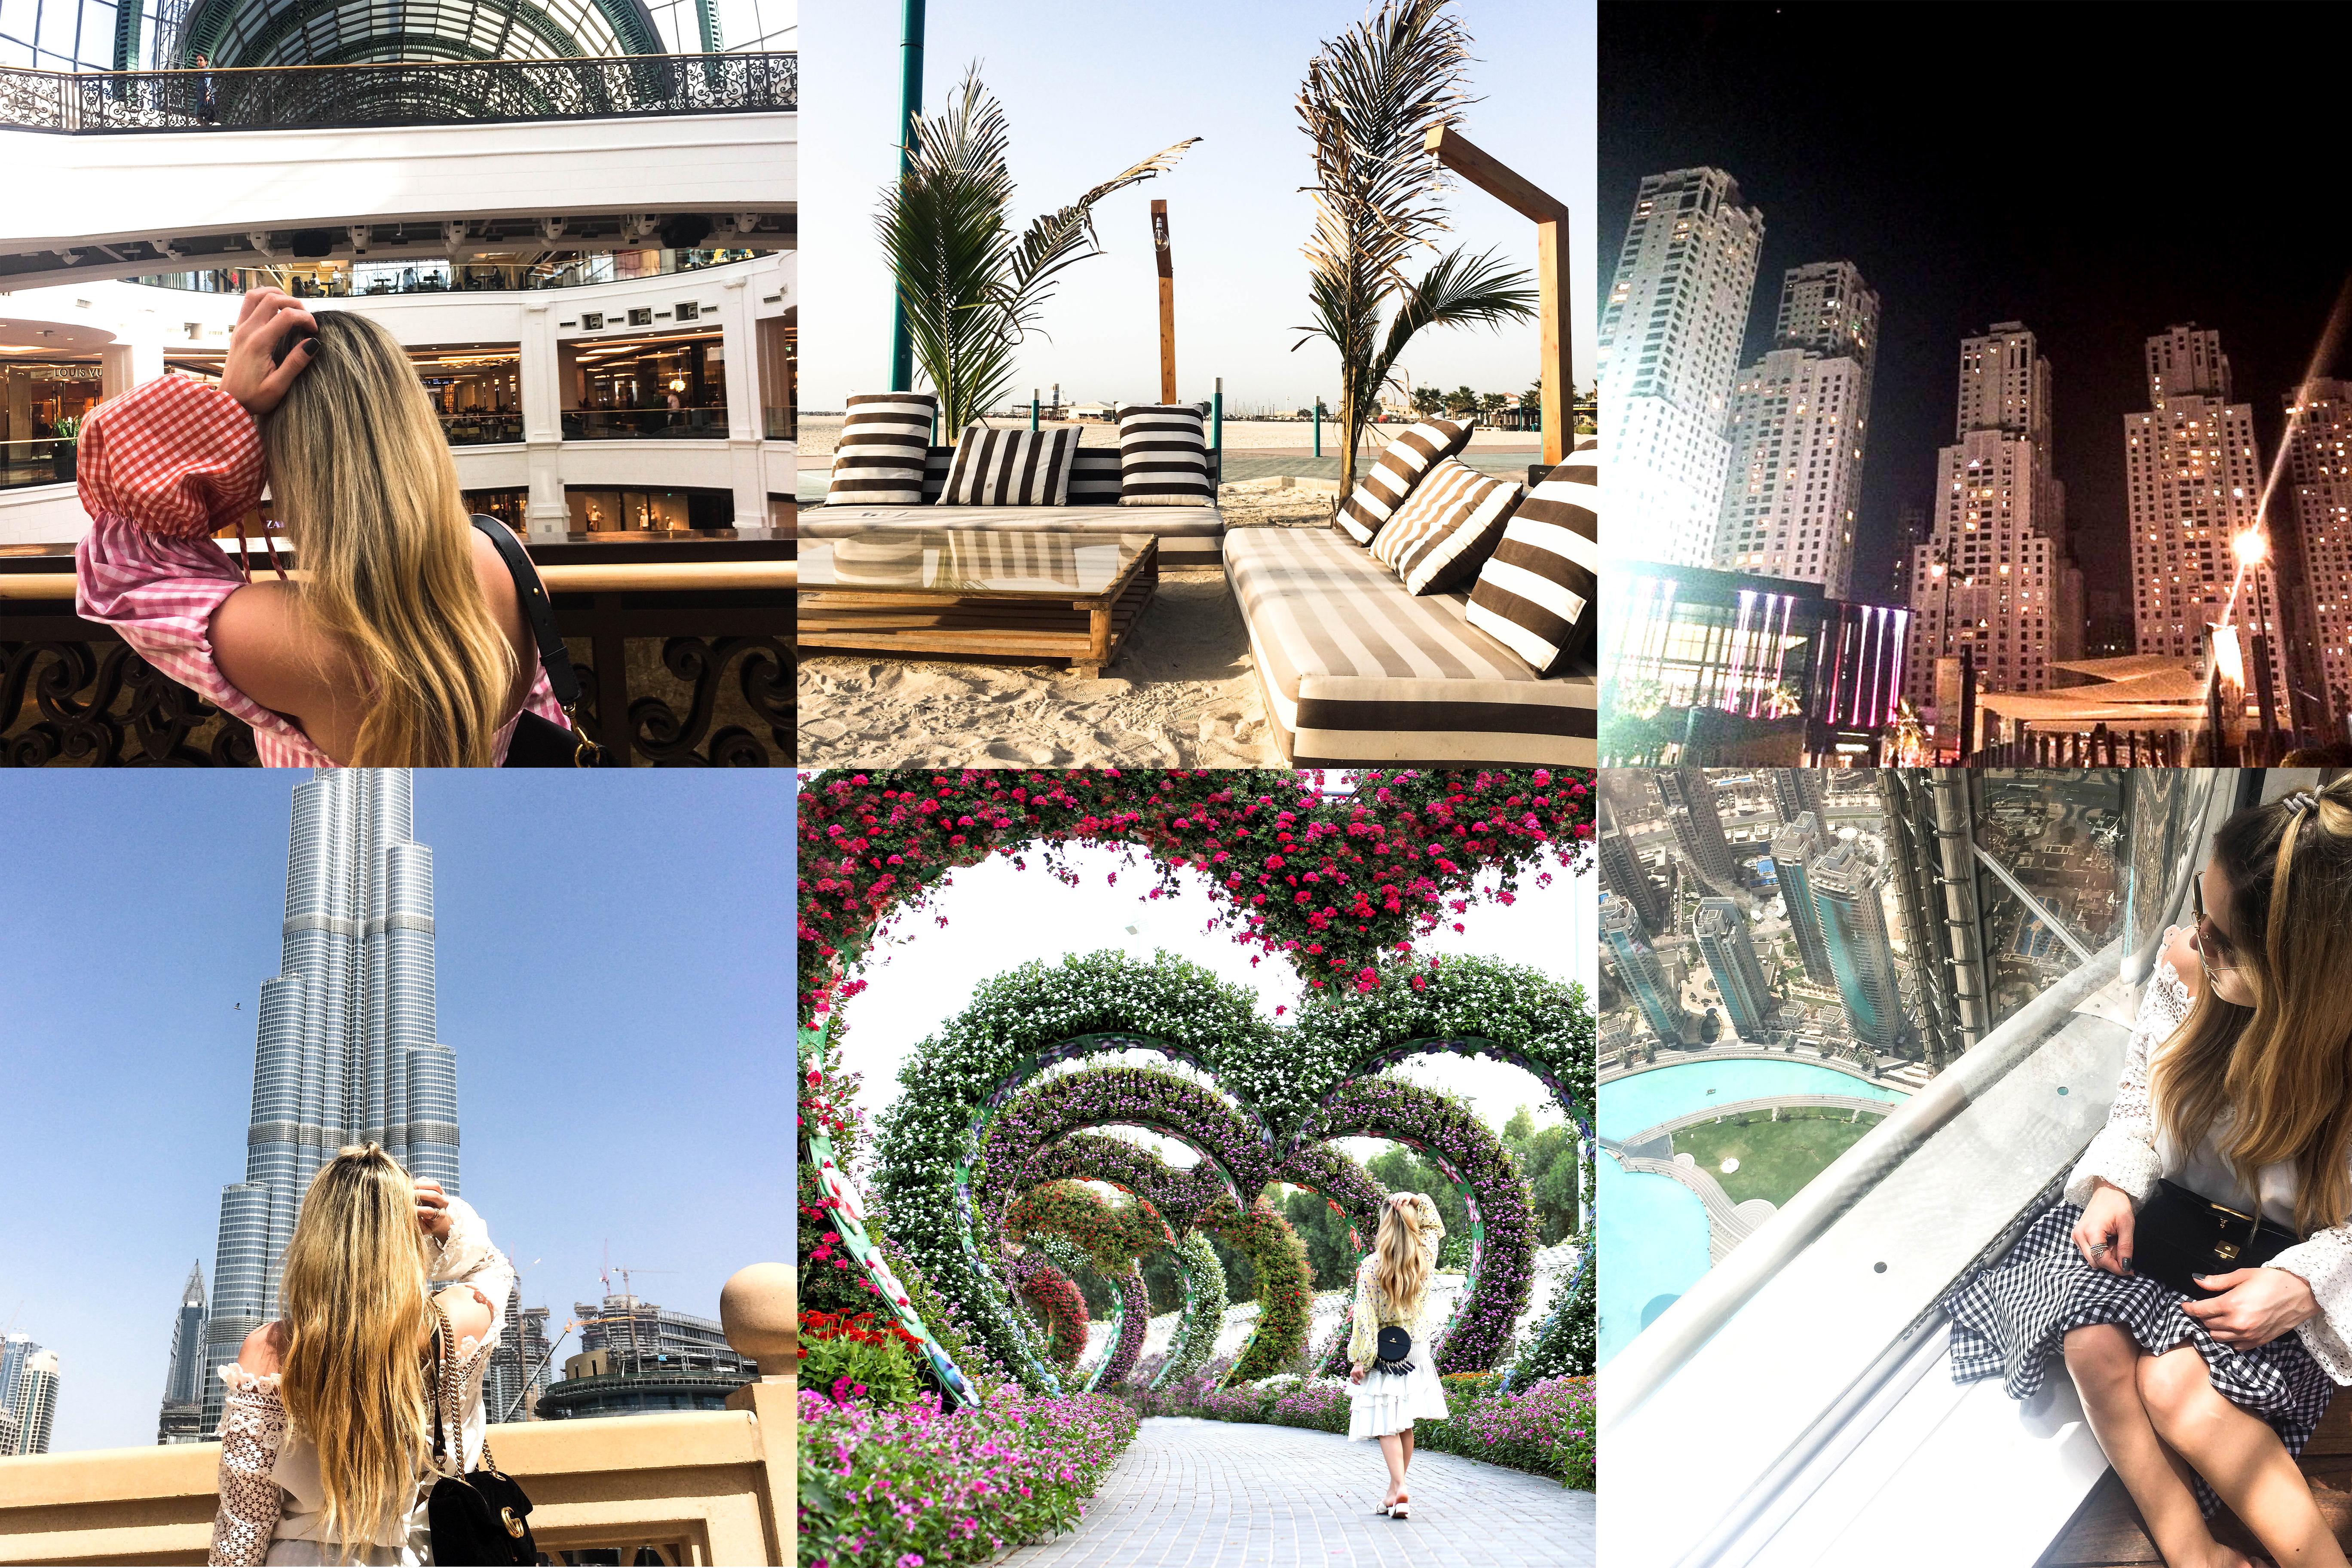 dubai-travel-guide-travelblog-dubai-travel-diary-dubai-tipps